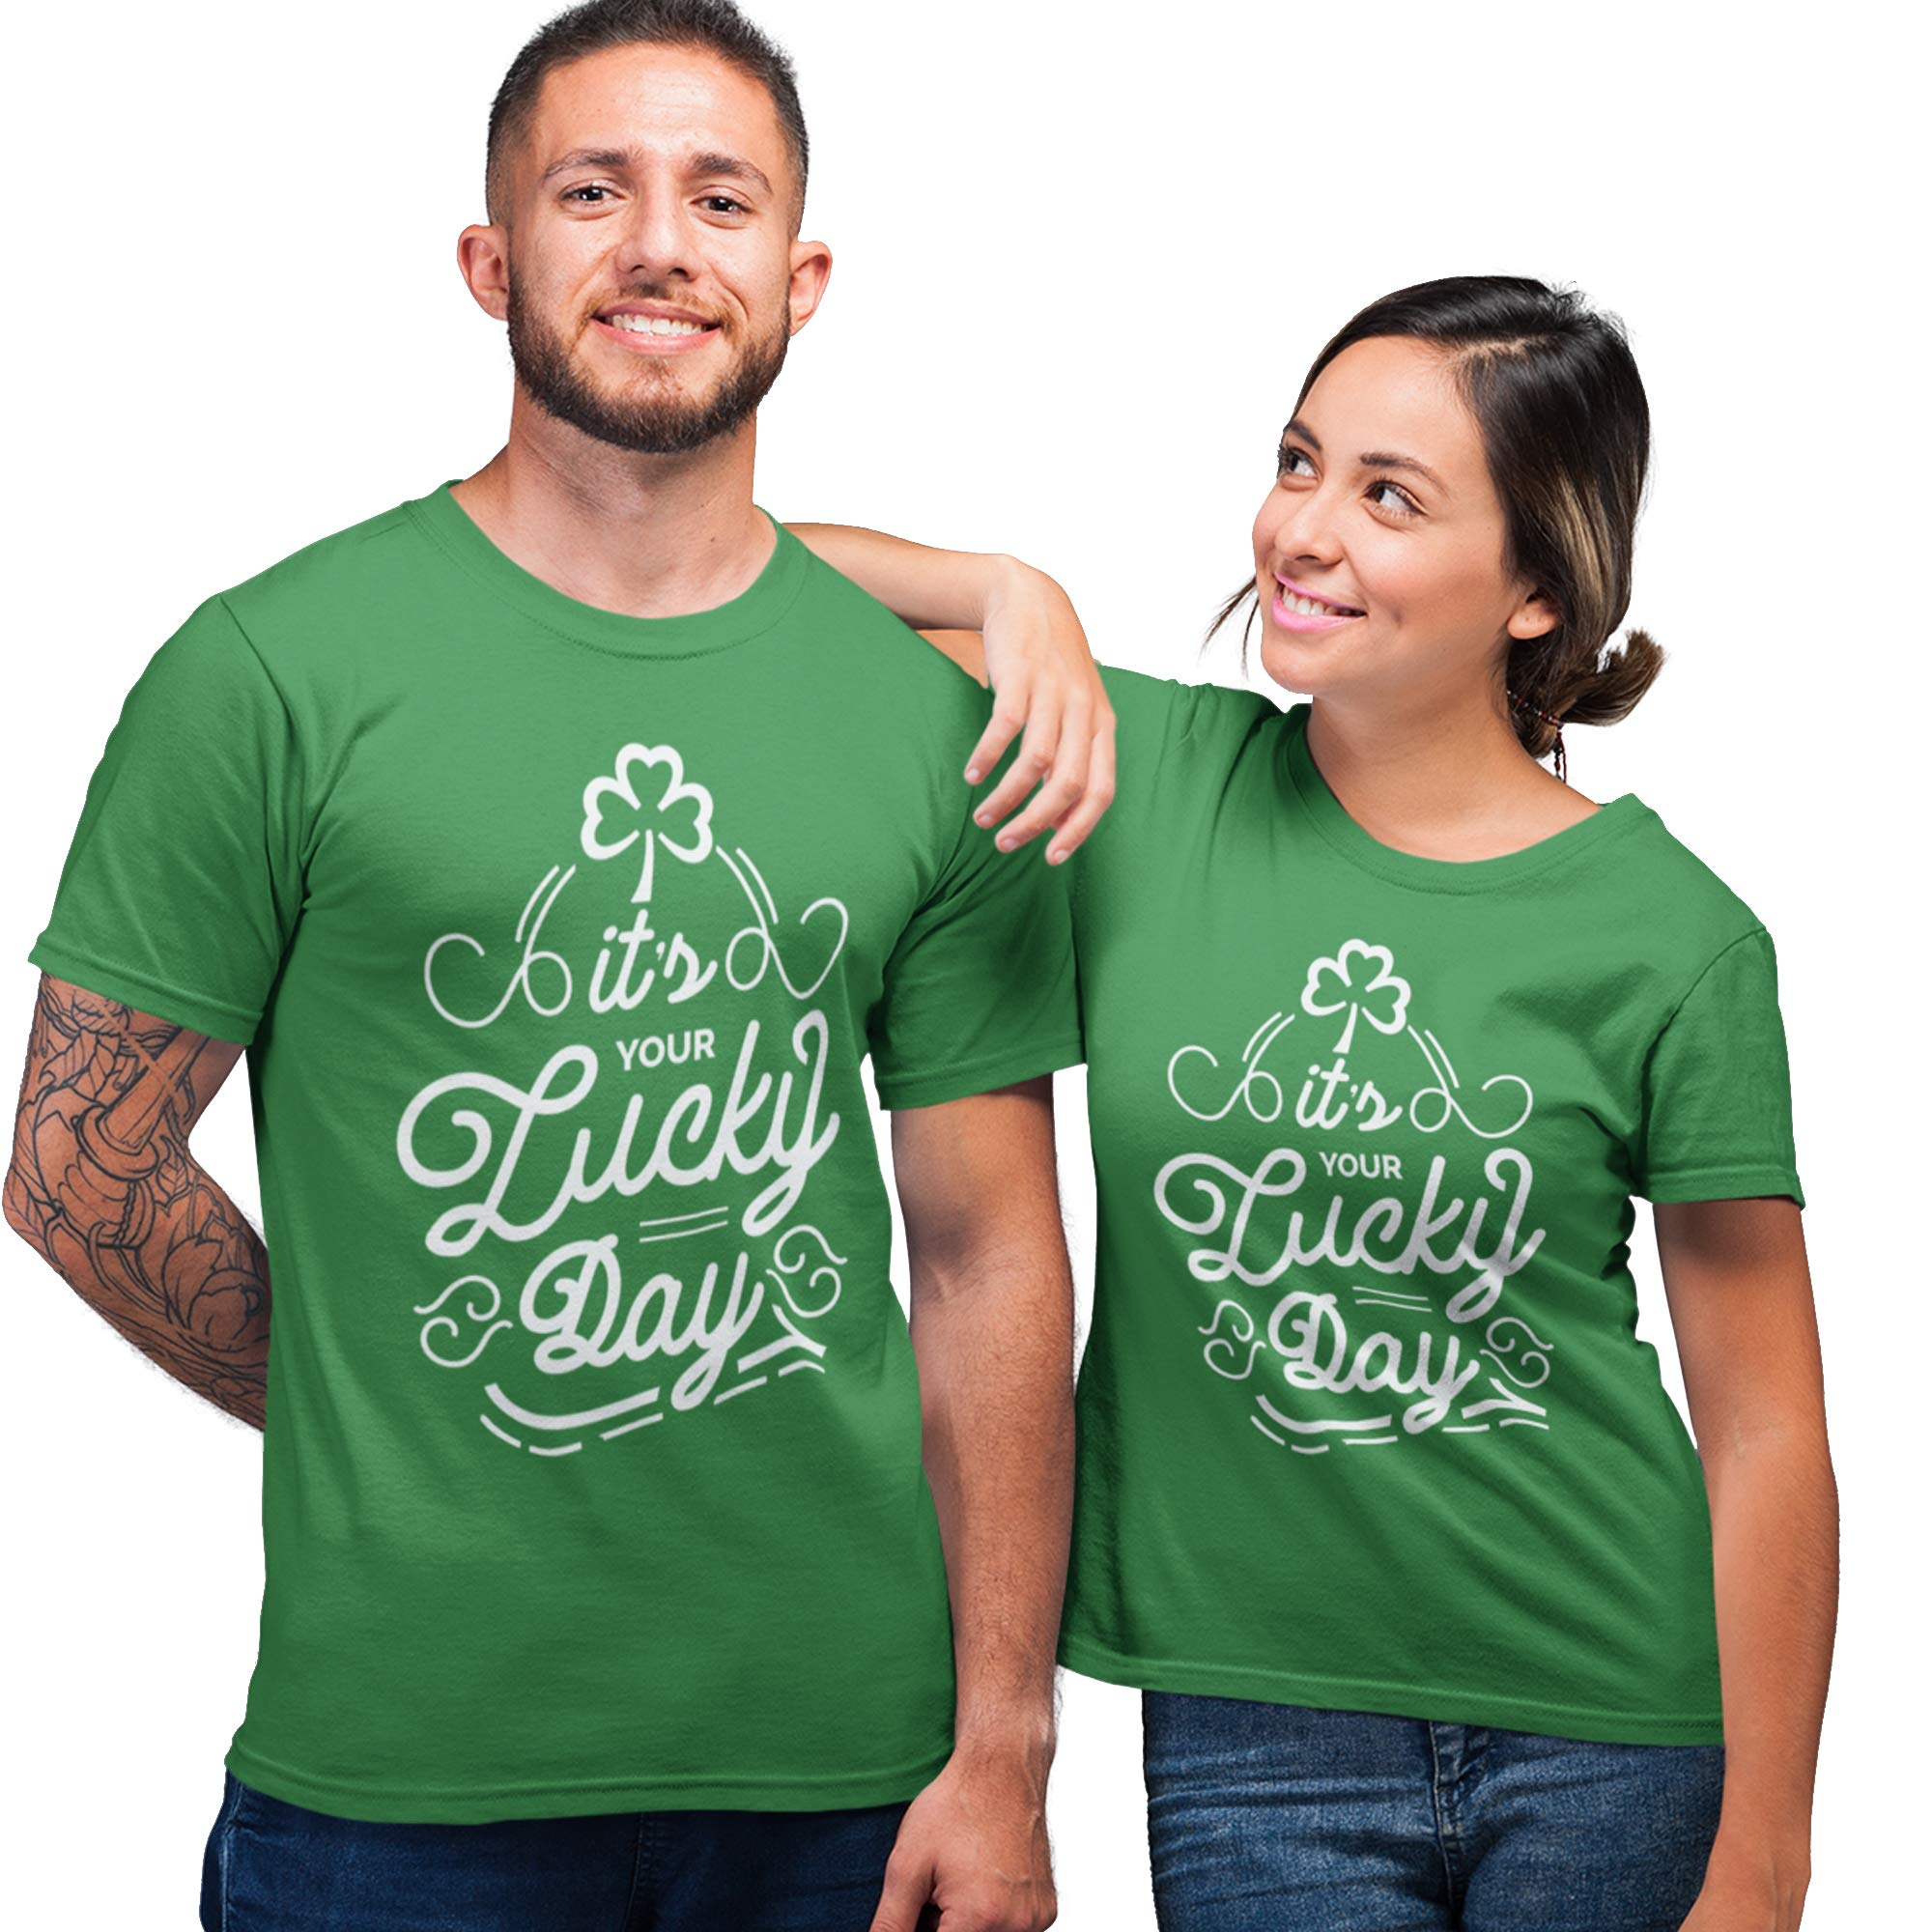 Purple Print House Irish T Shirt St Patricks Day Decorations Ireland Gifts Leprechaun Costume Funny T Shirts